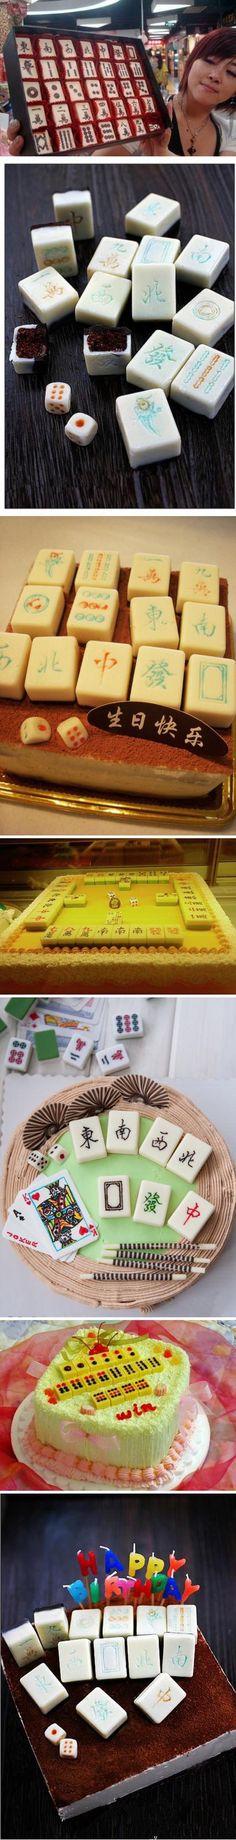 MJ cakes